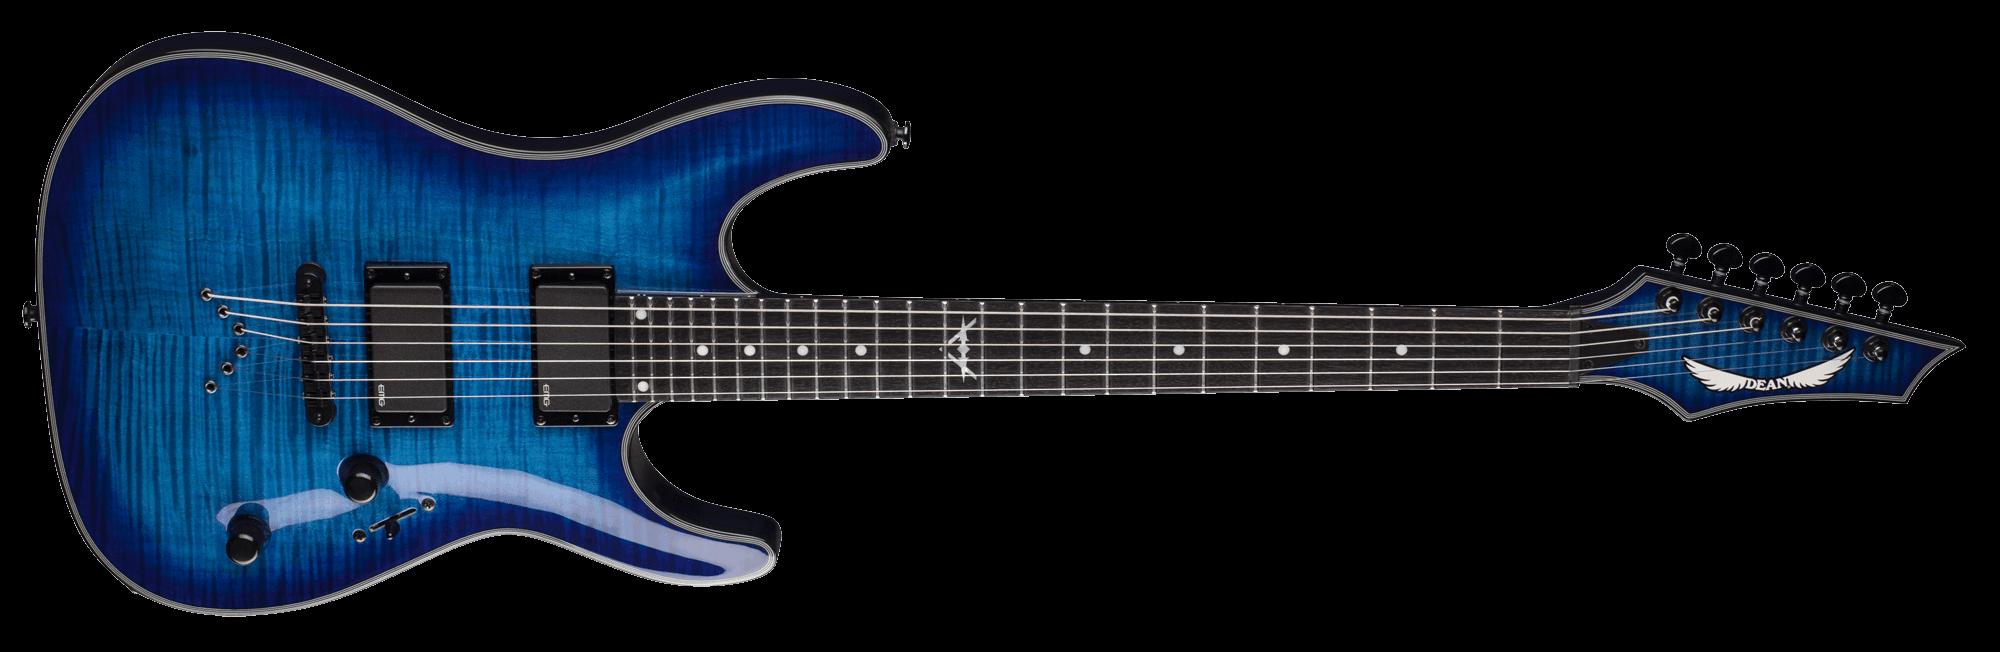 Electric Guitar Blue Png Image Blue Guitar Modern Arrangements